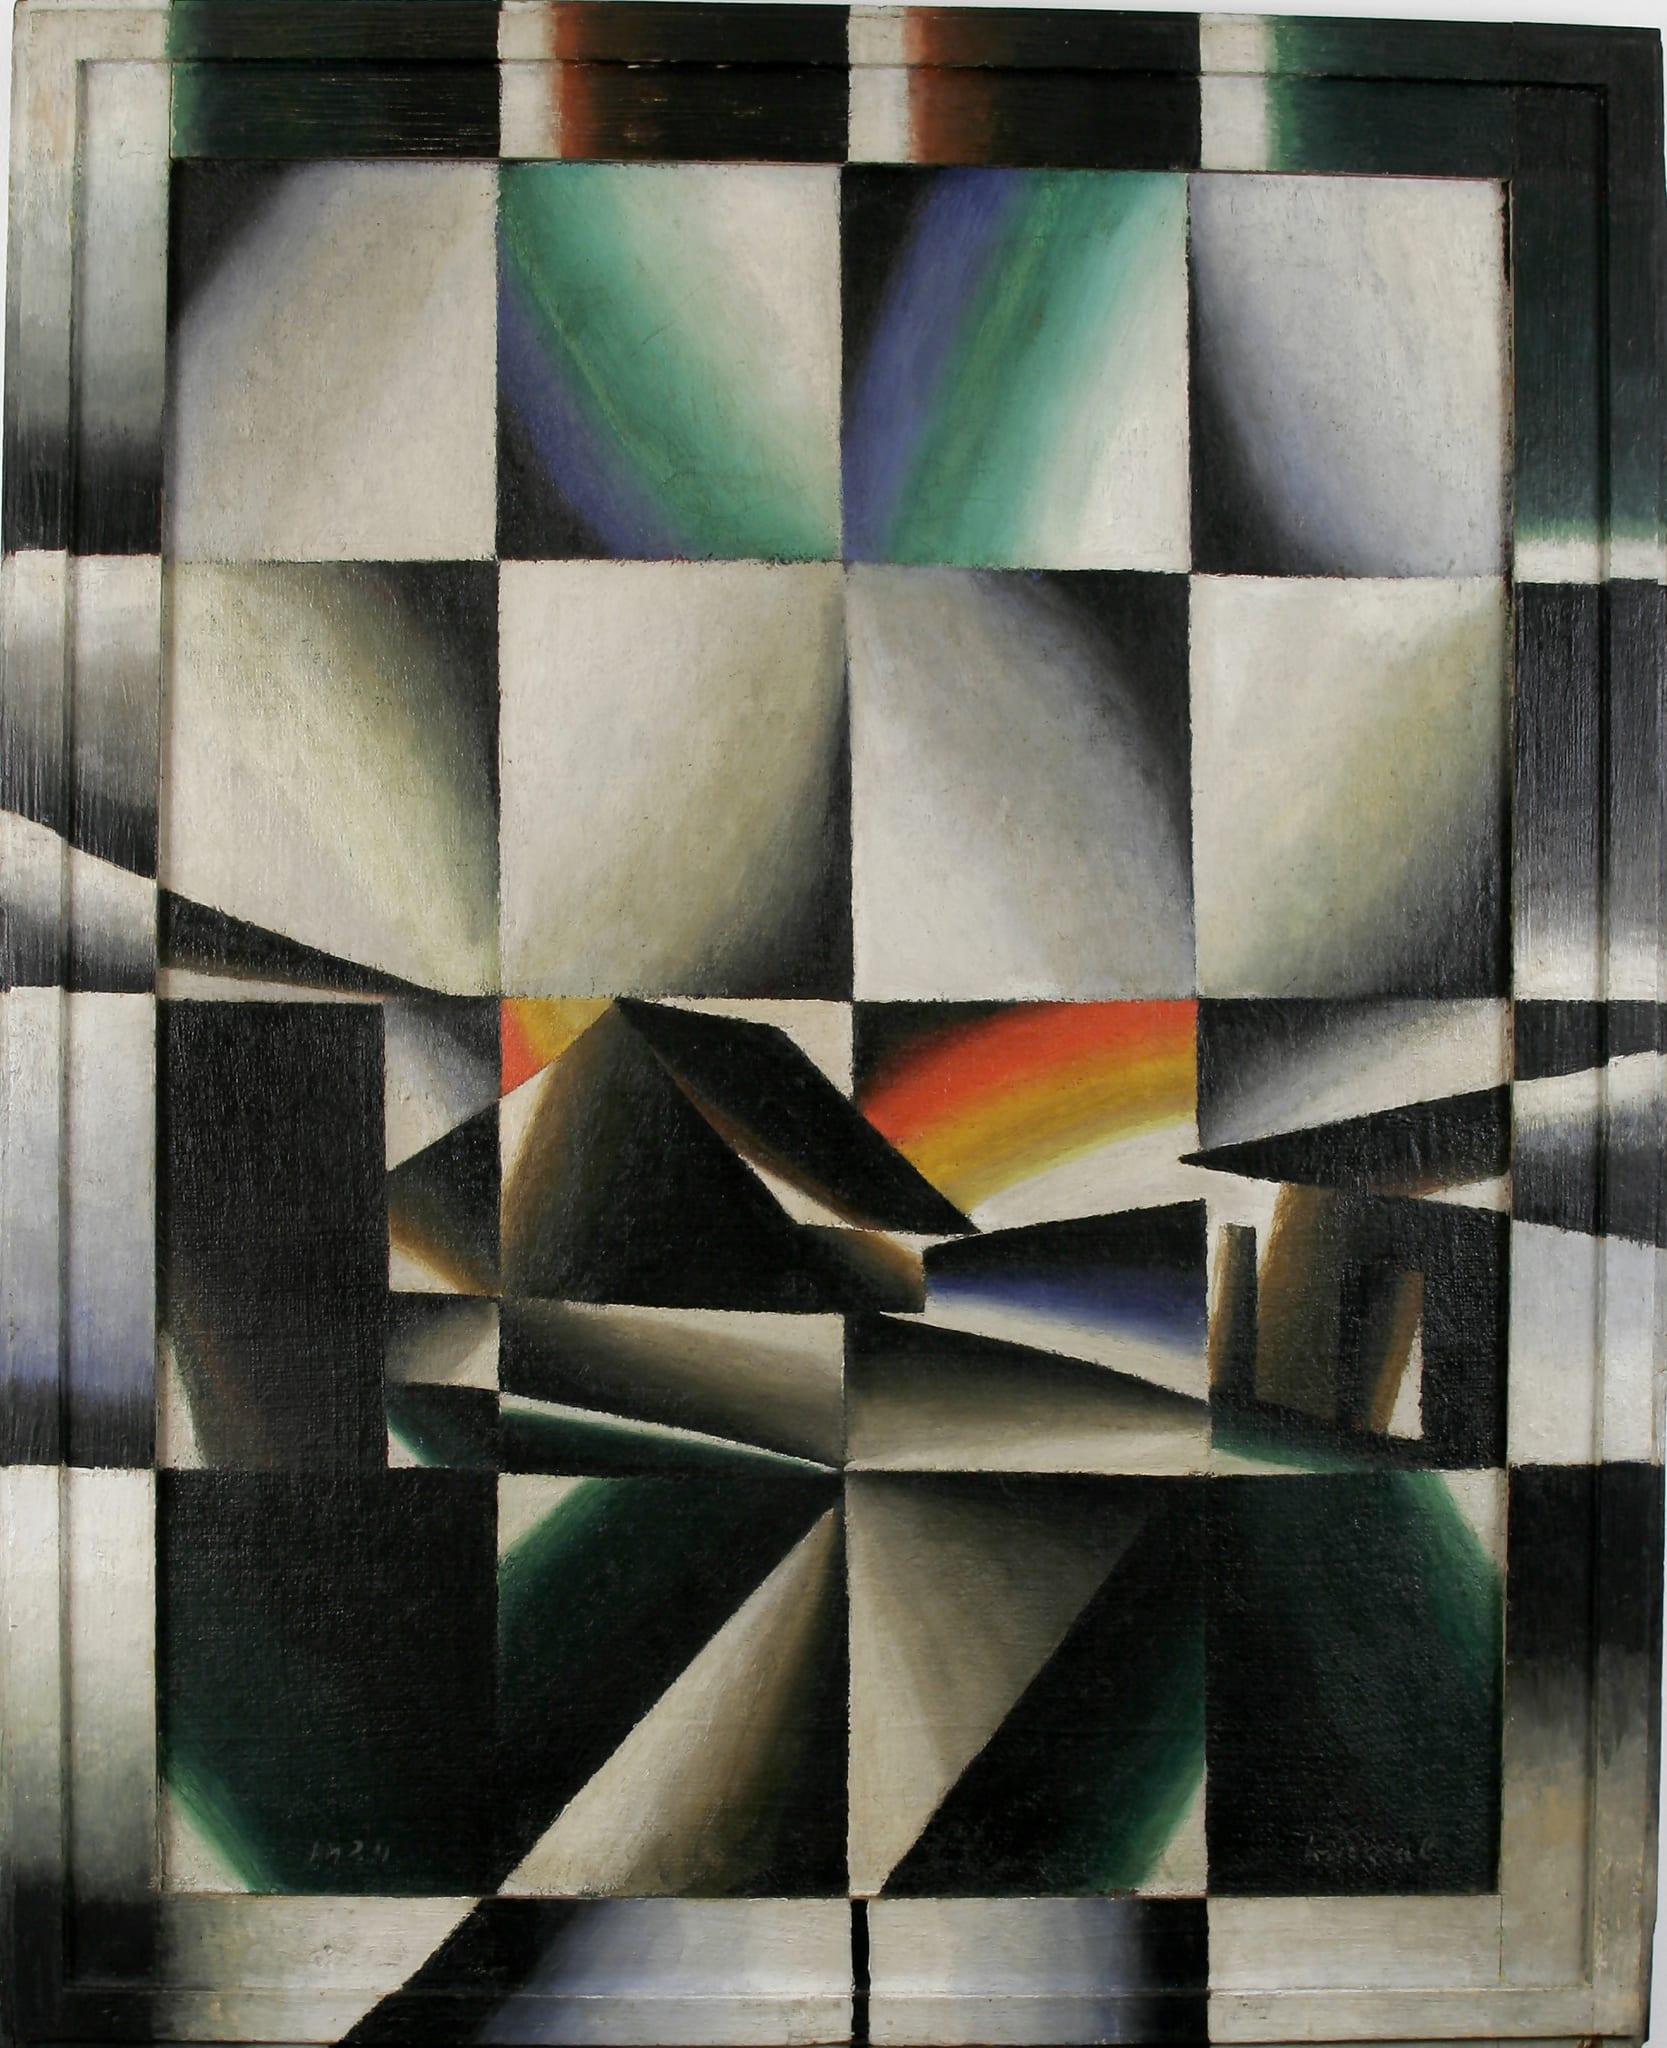 Regenbogen (prismatisch) by Arthur Segal